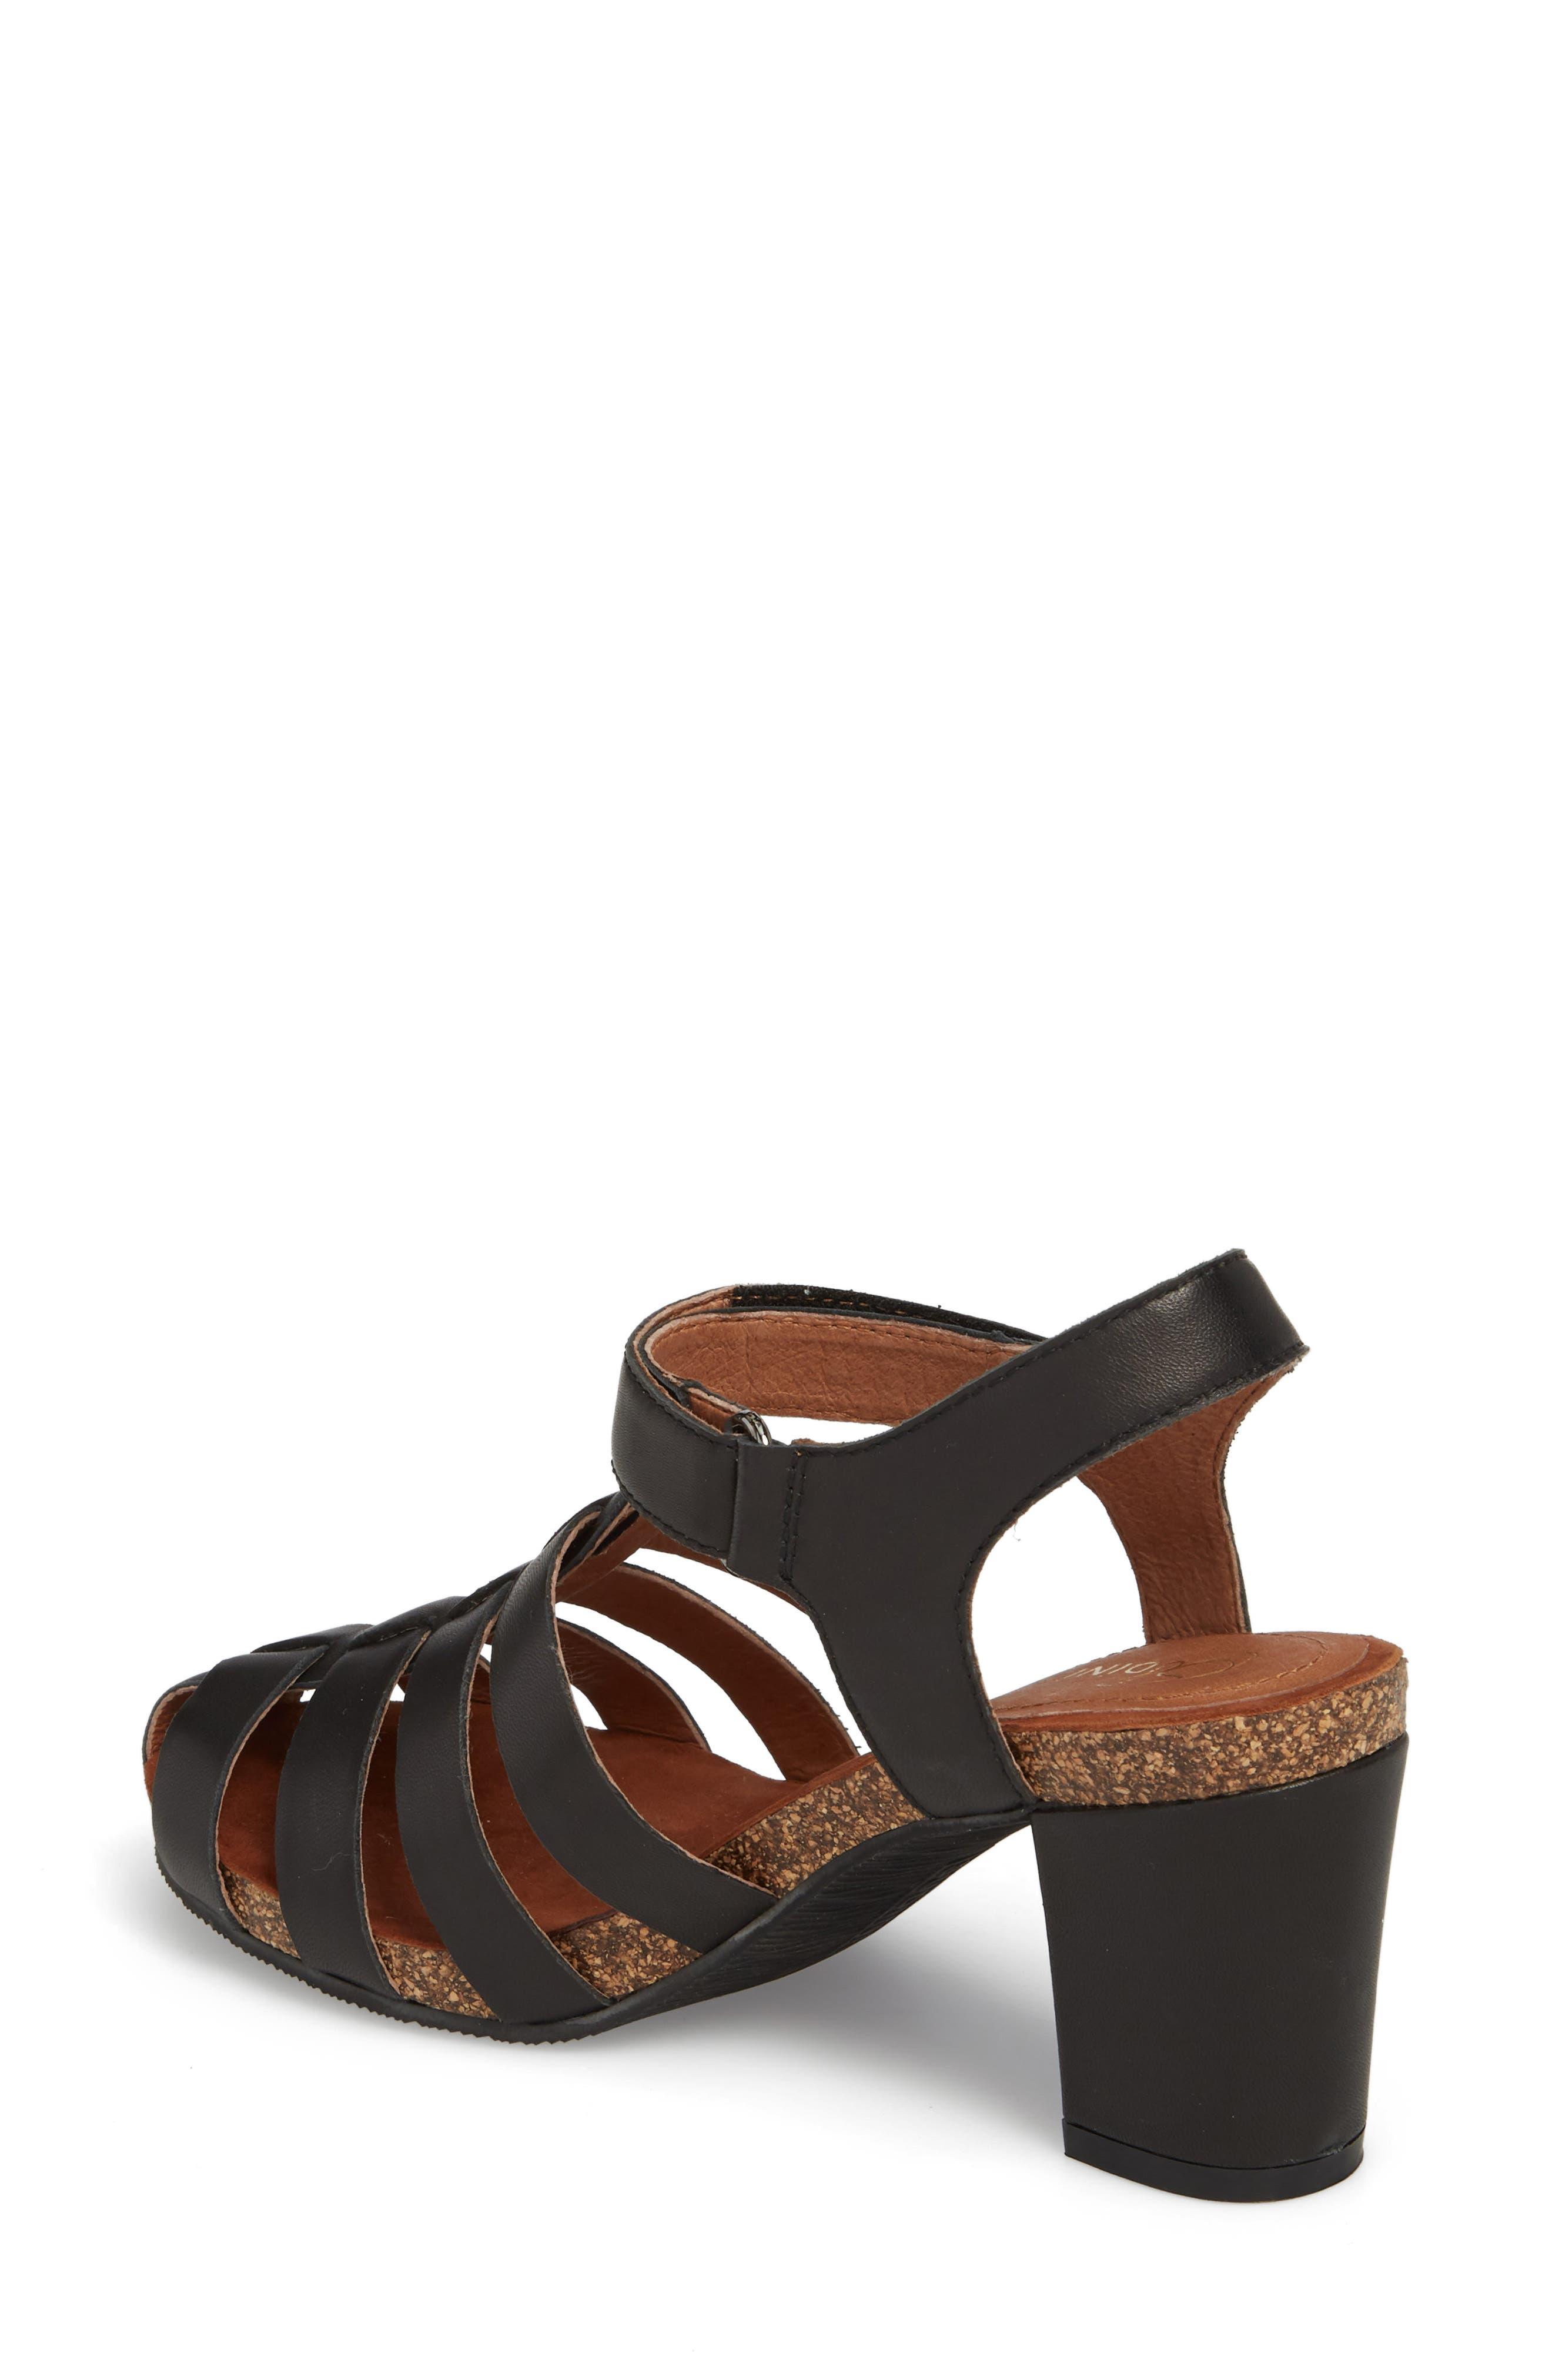 Carrara Block Heel Sandal,                             Alternate thumbnail 2, color,                             BLACK LEATHER